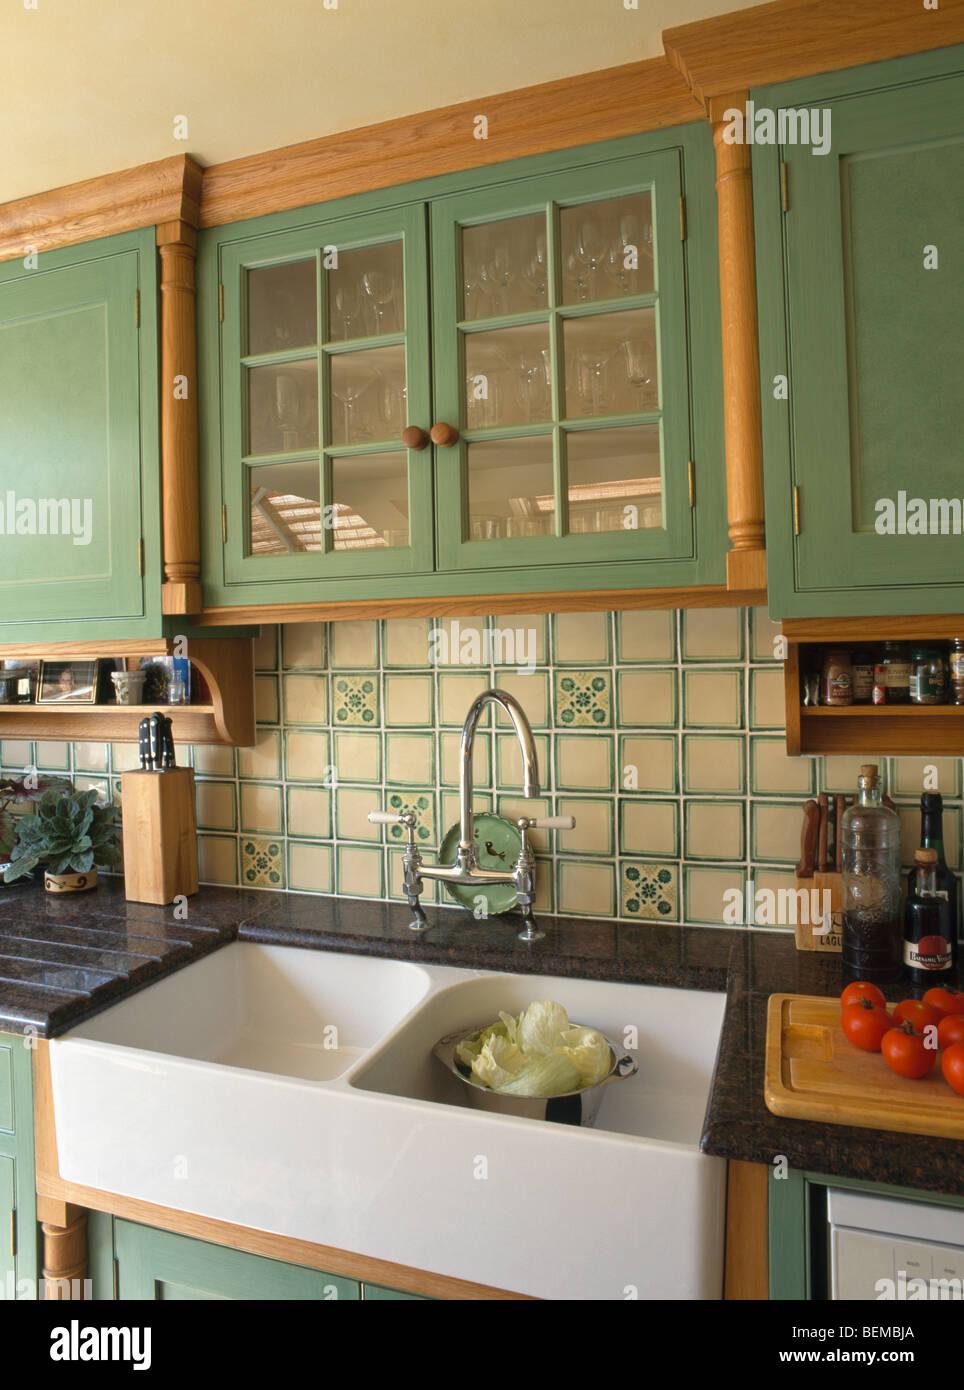 Interiors Traditional Green Kitchens Imágenes De Stock & Interiors ...